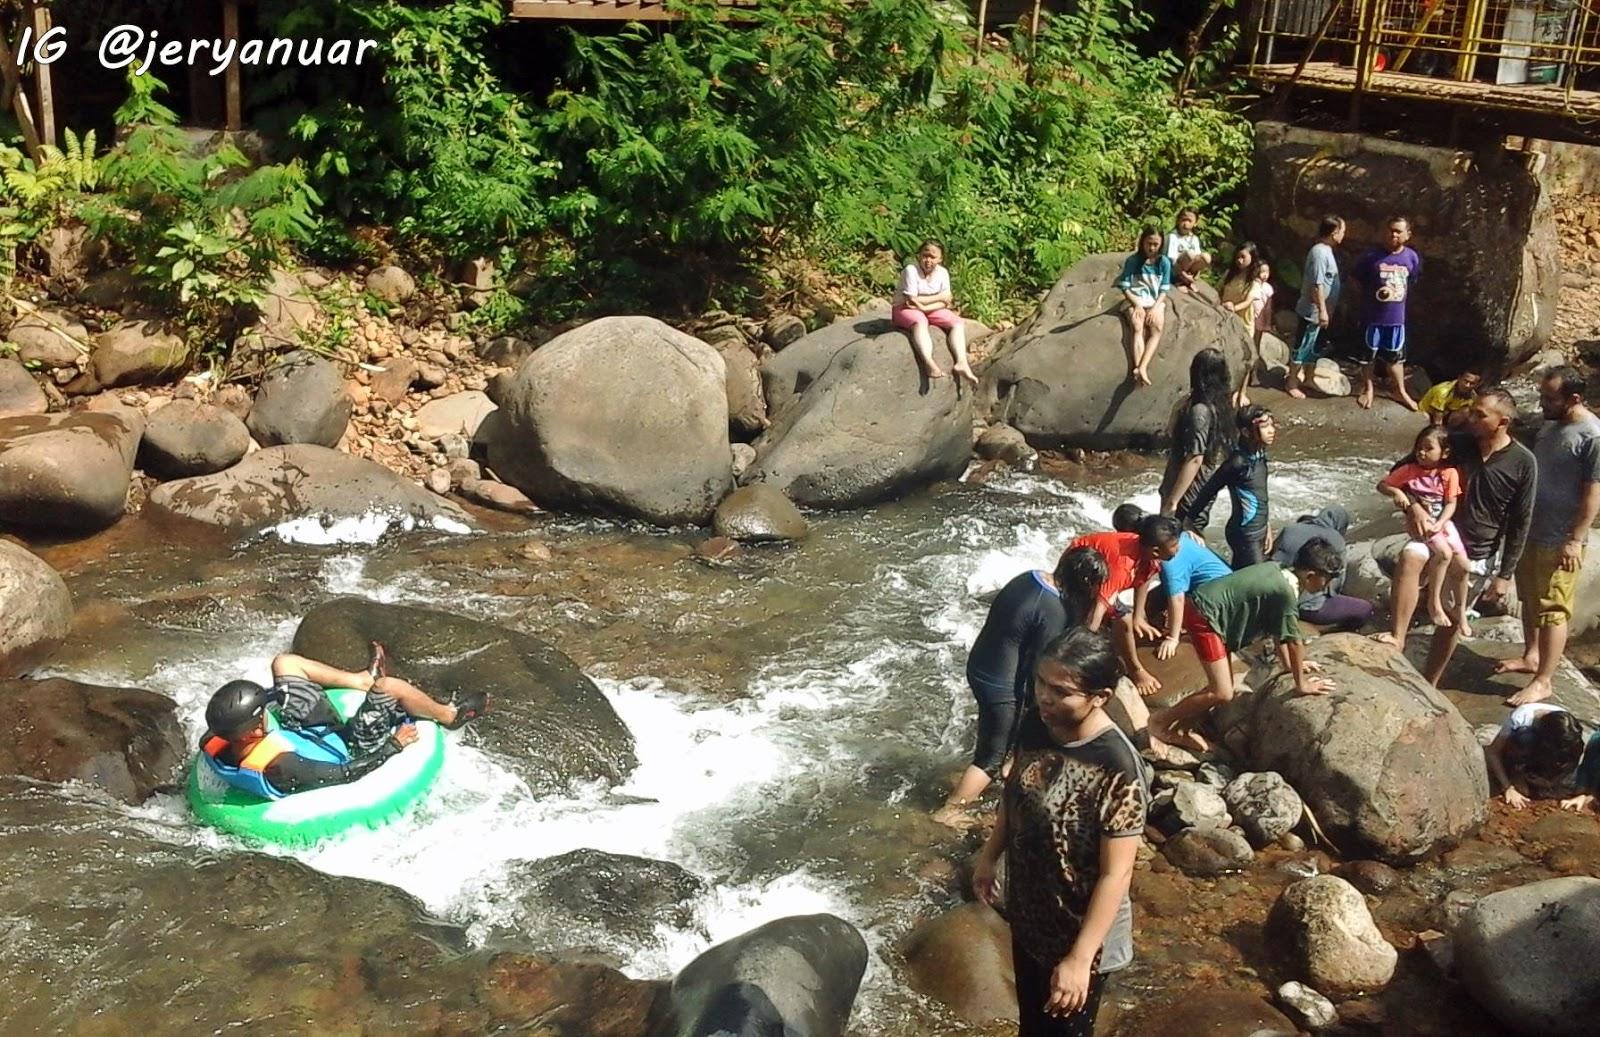 Olahraga Air River Tubing & Tipsnya